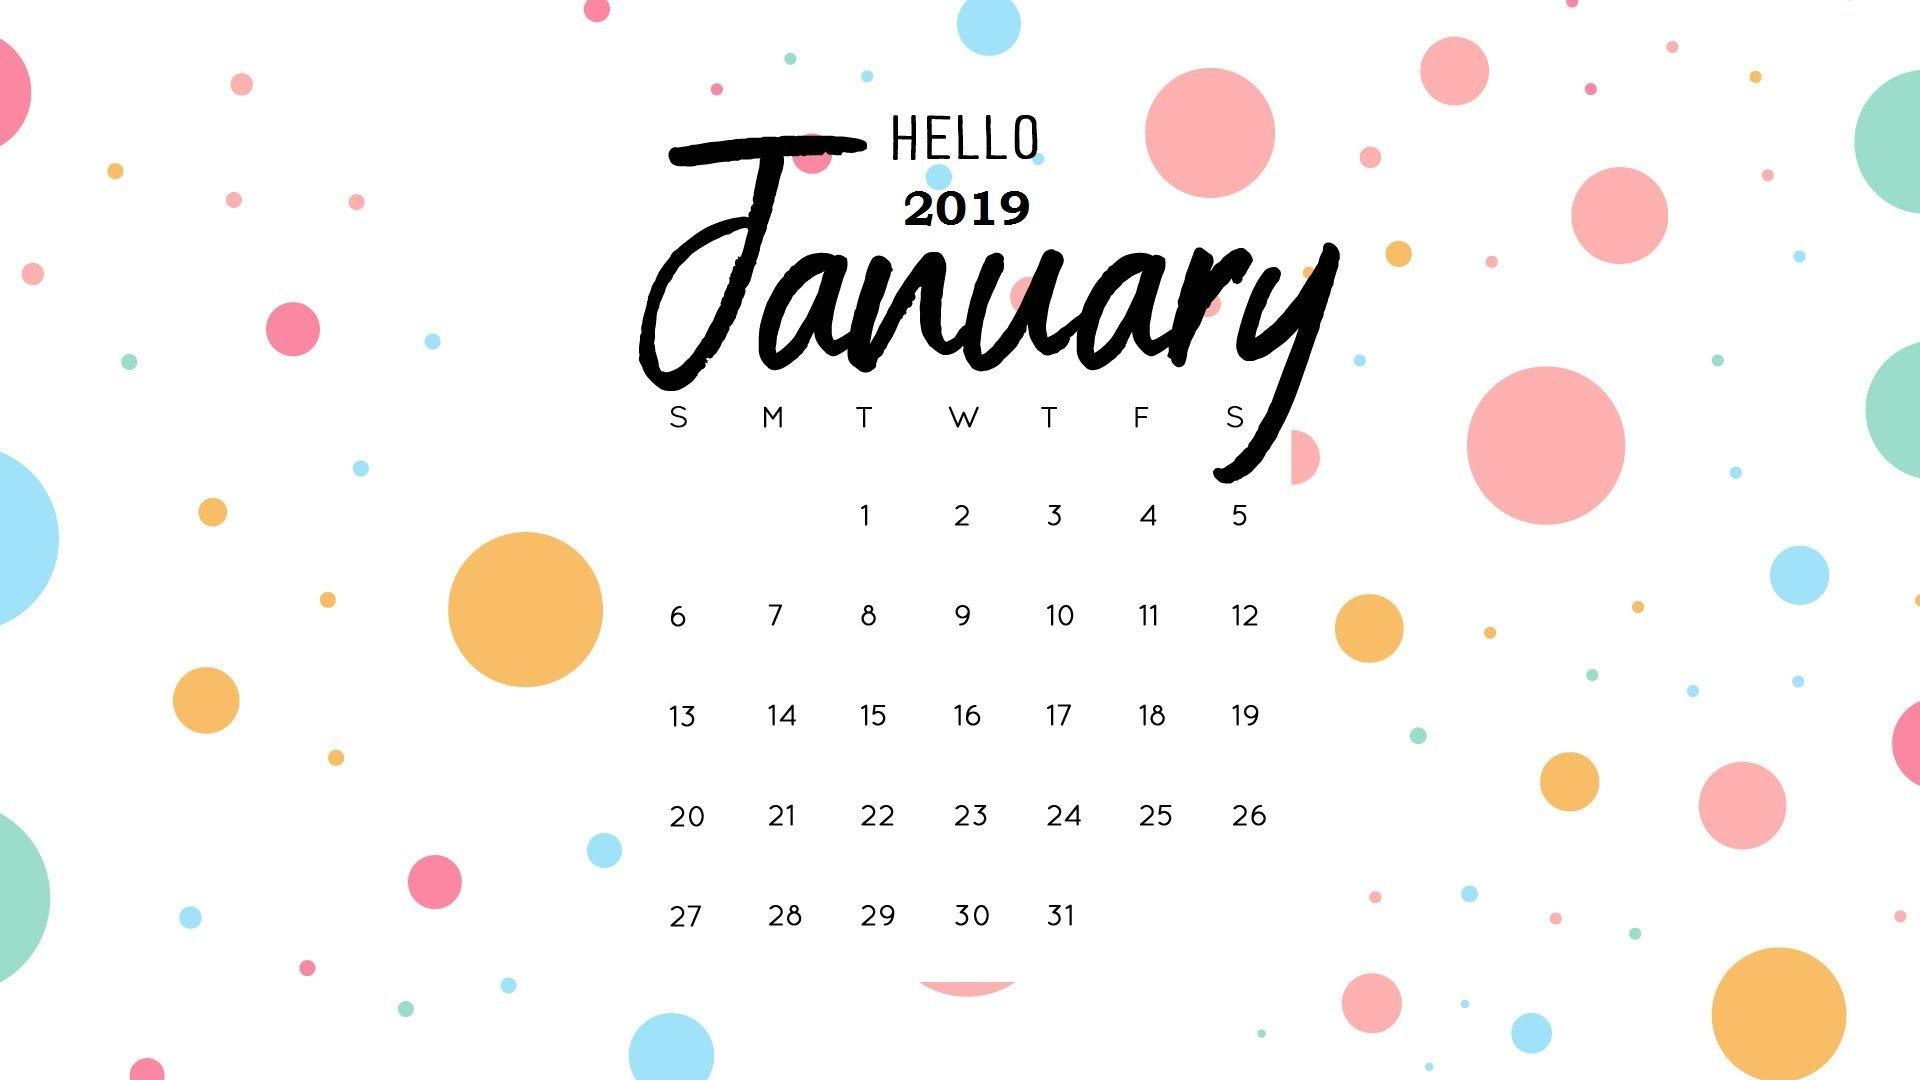 Hello January 2019 Calendar Wallpaper | Monthly Calendar Templates Calendar 2019 Wallpaper